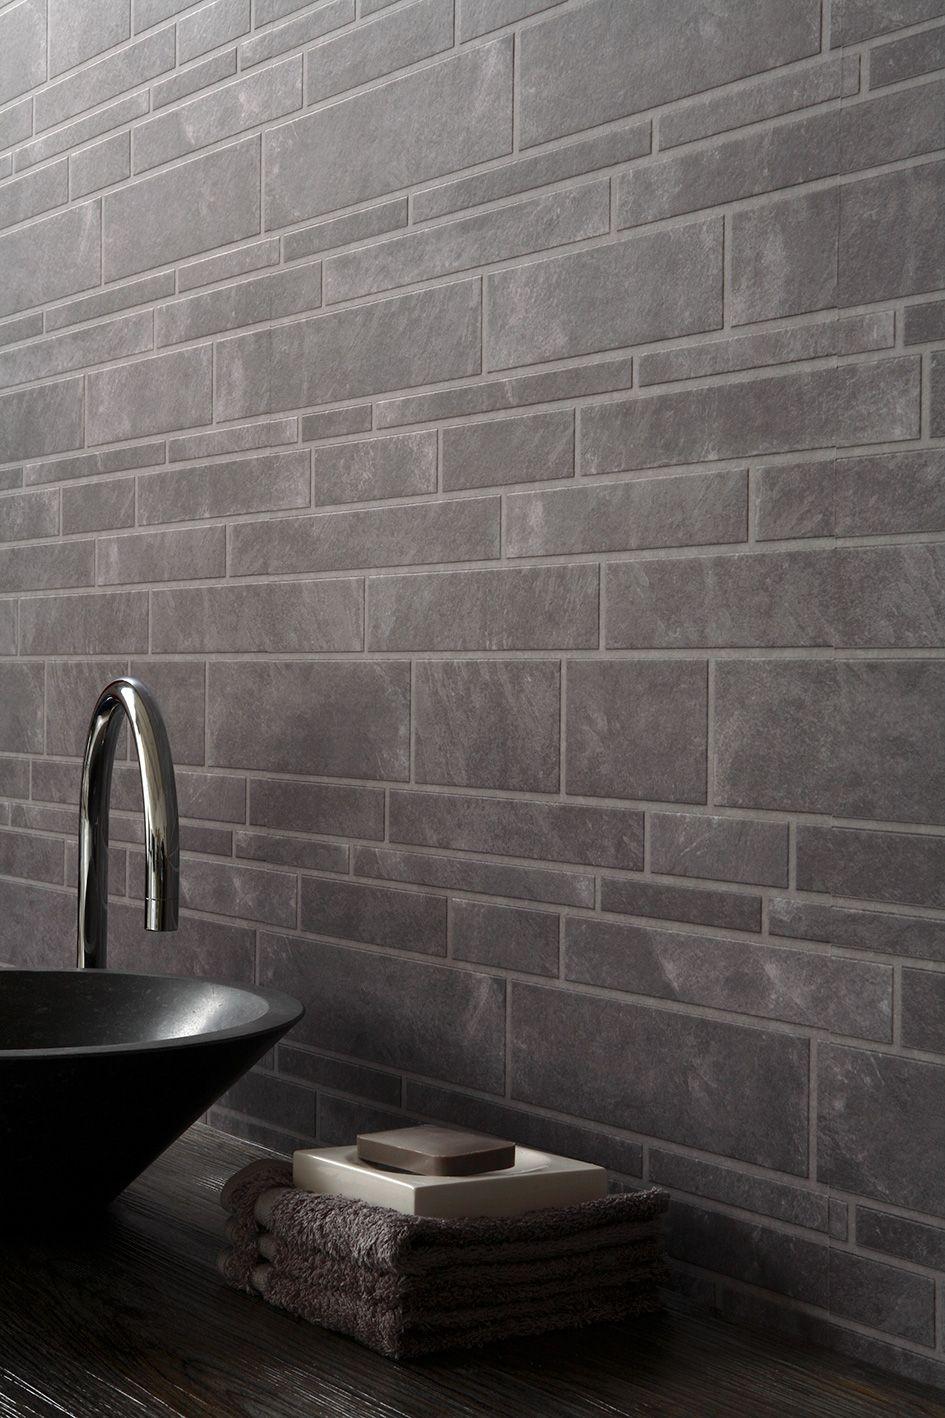 Bathroom wallpaper inspiration from Graham & Brown